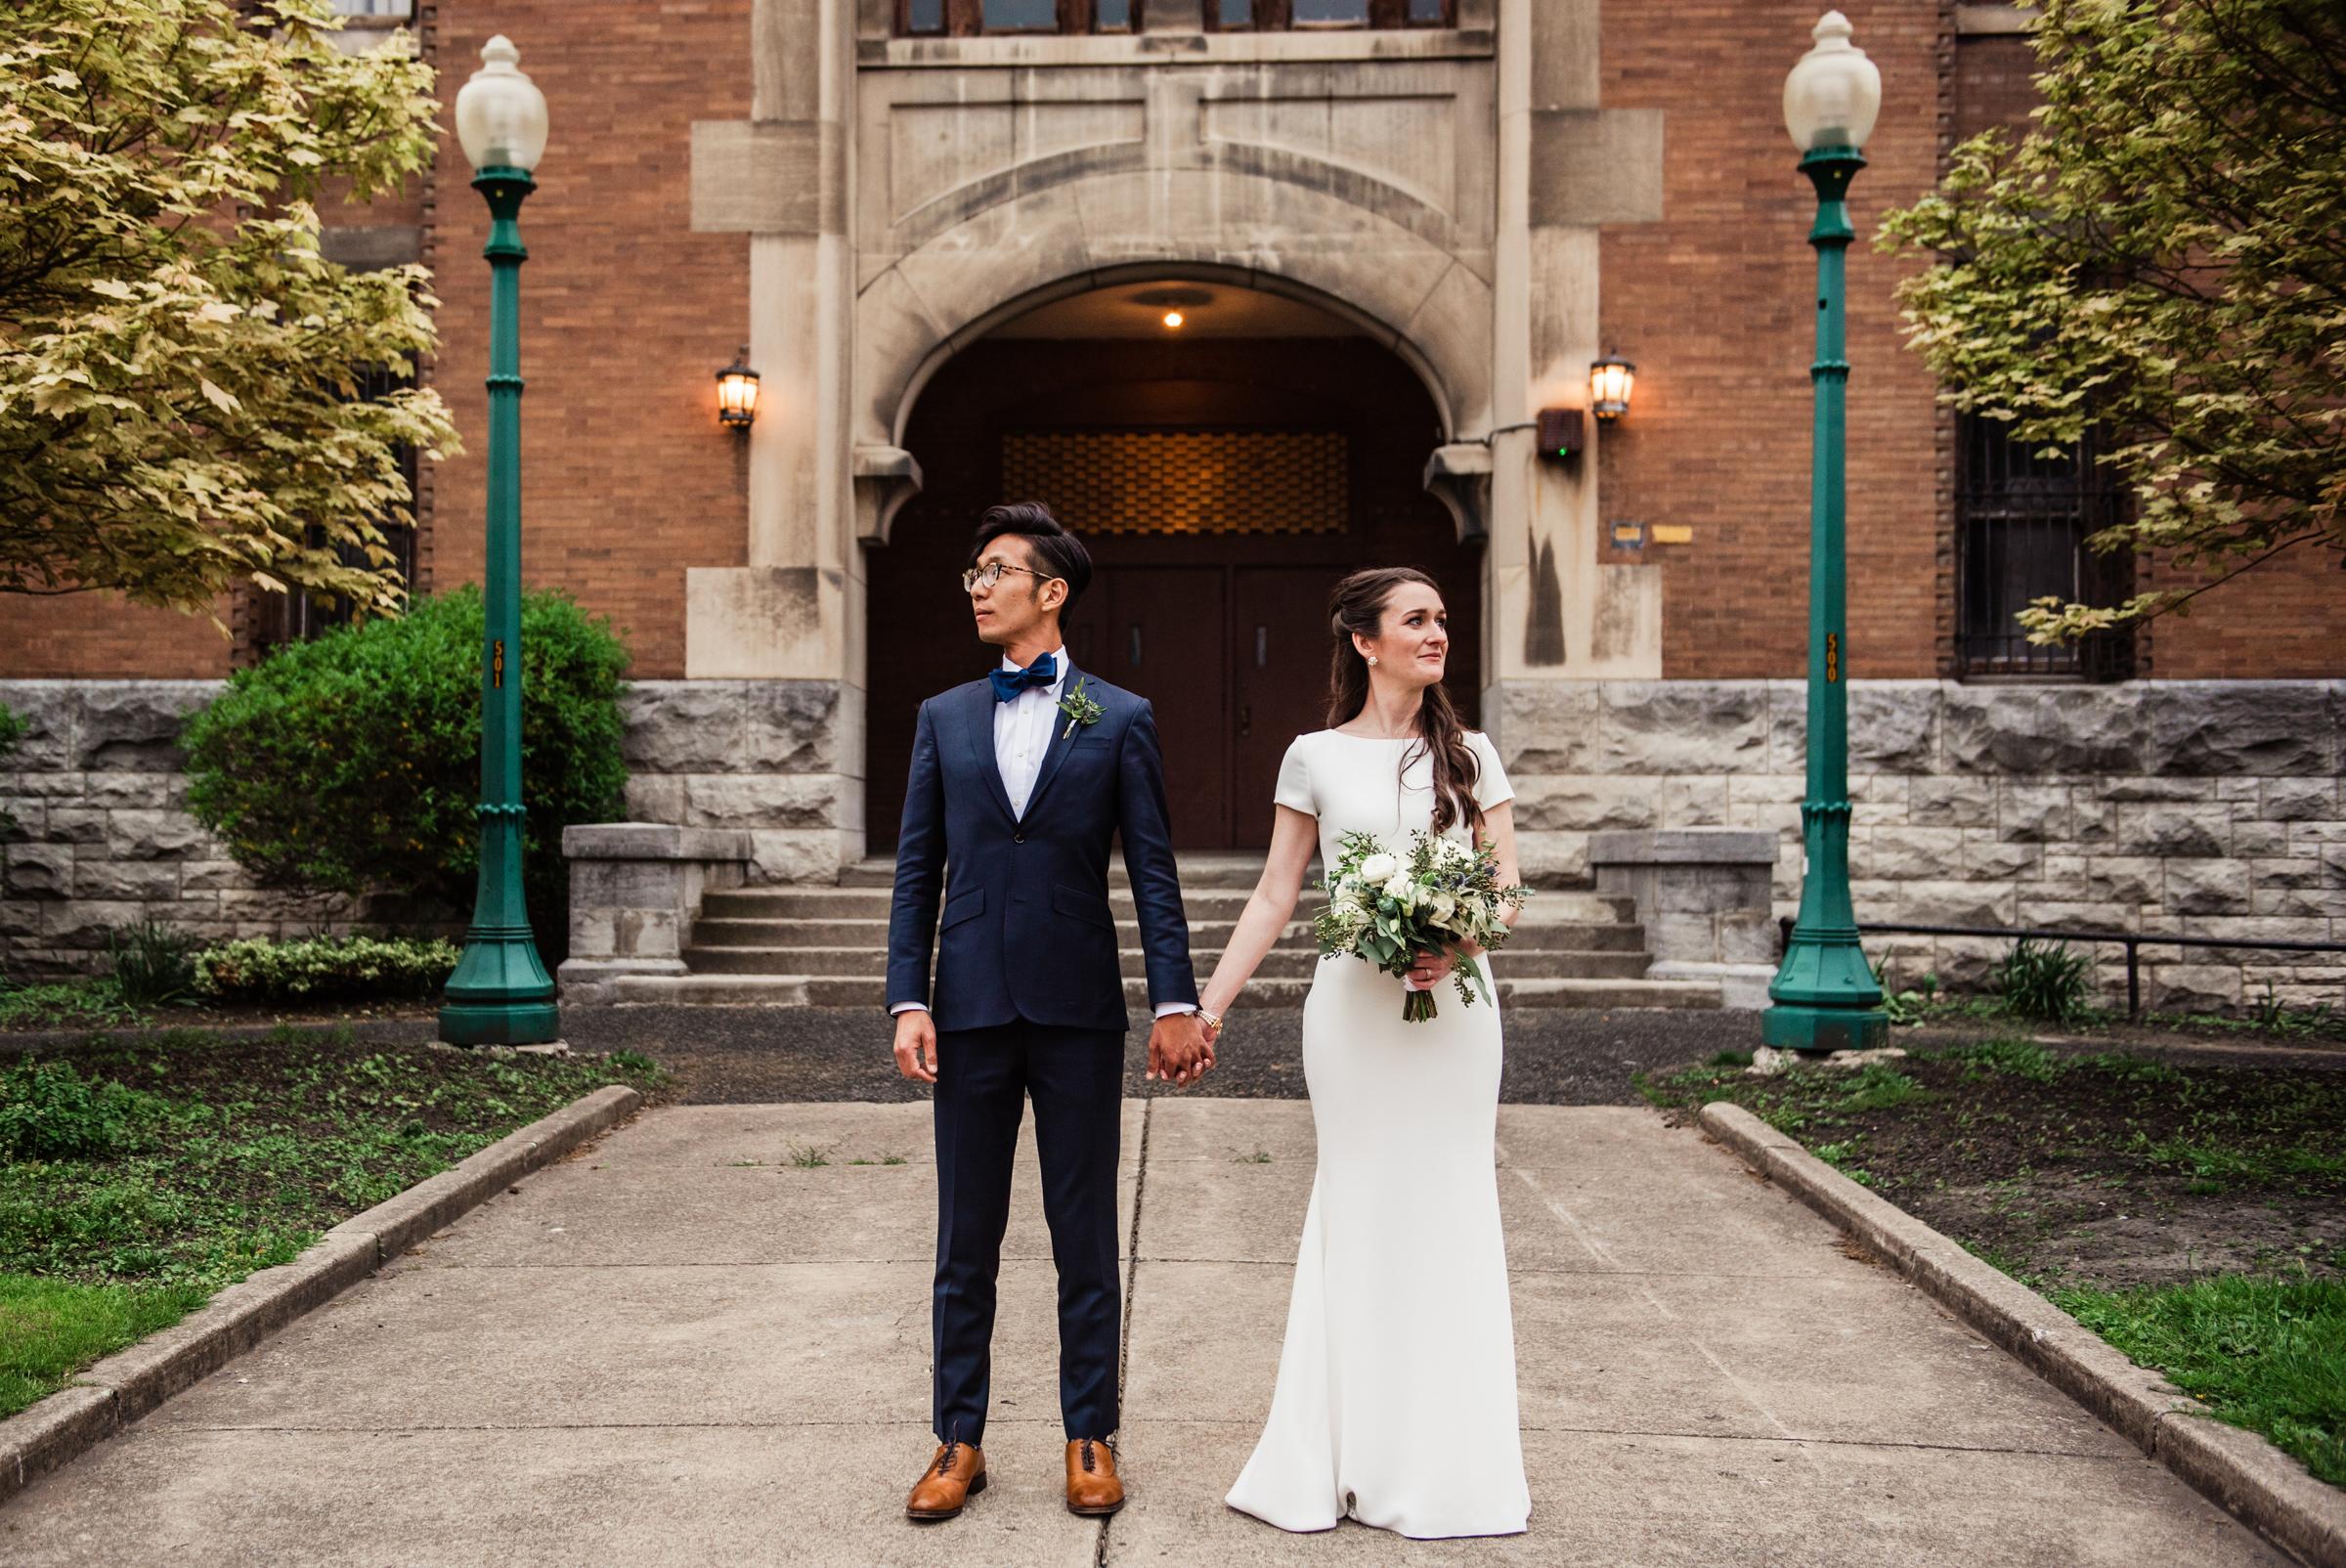 SKY_Armory_Syracuse_Wedding_JILL_STUDIO_Rochester_NY_Photographer_DSC_6220.jpg